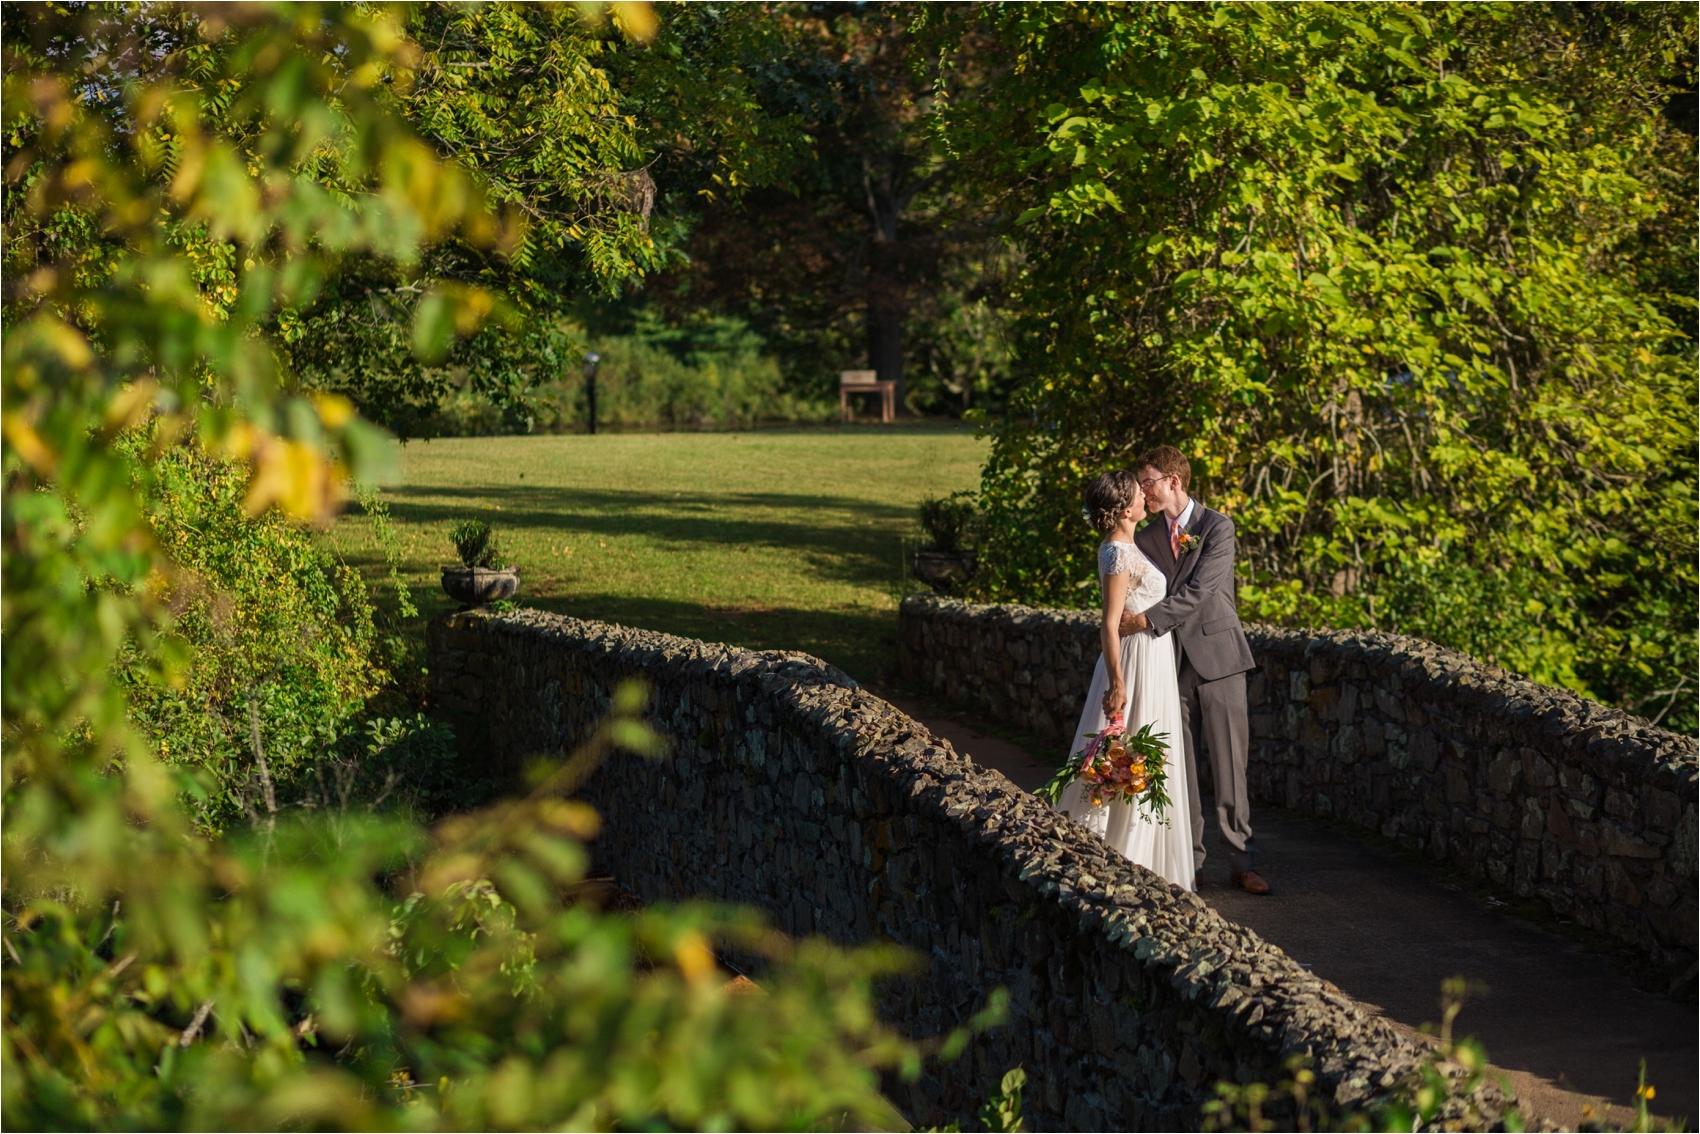 Feather-and-Oak-Rainforest-Trust-Virginia-Wedding-0765.jpg